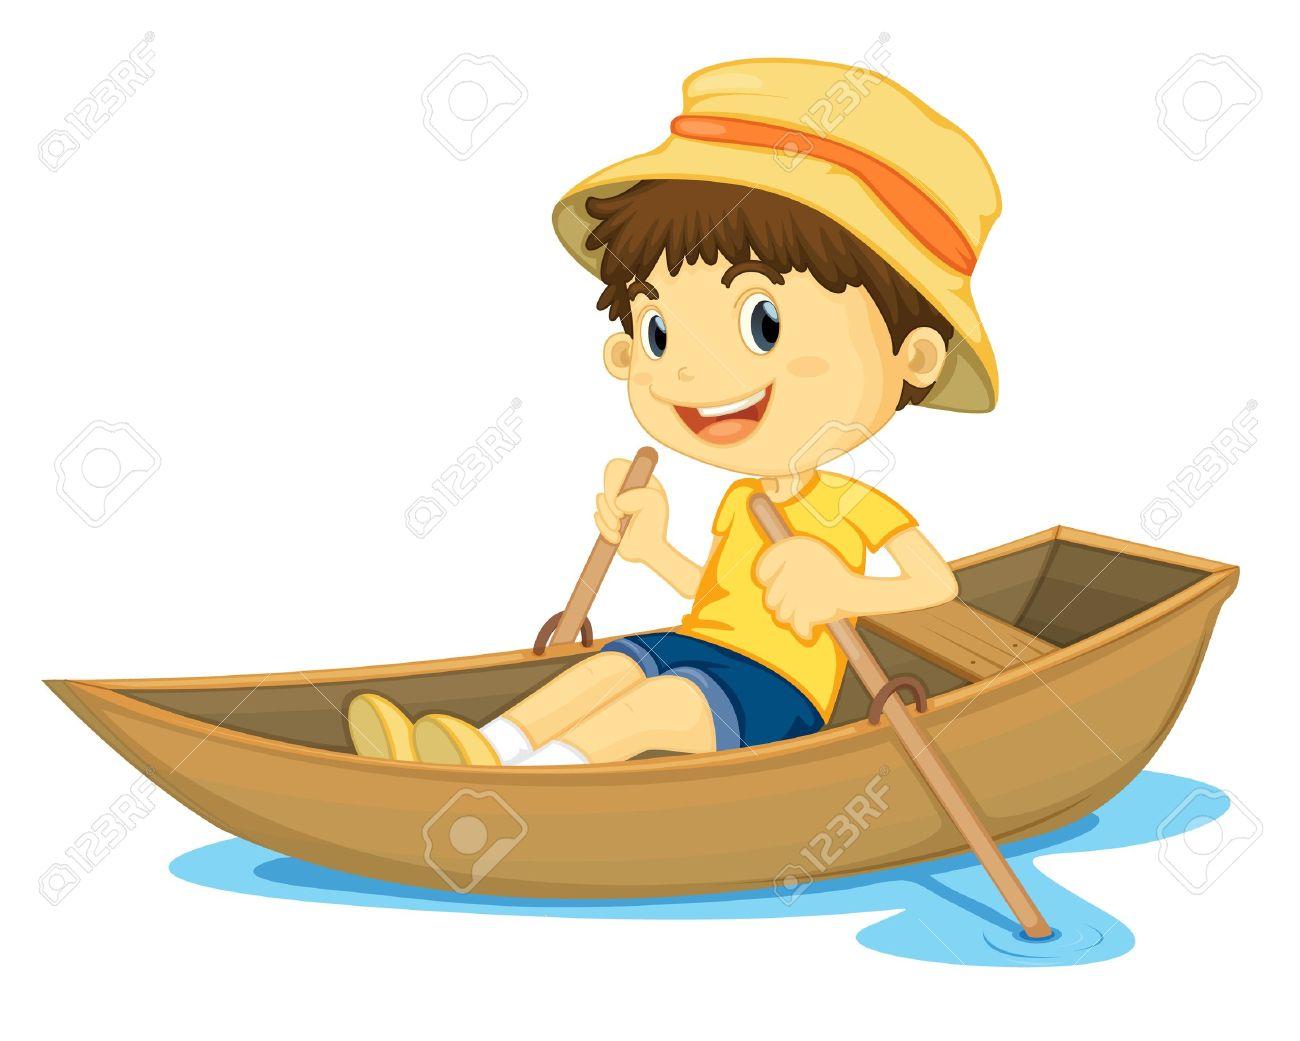 Row Boat Illustration Rowing Boat Illustration of